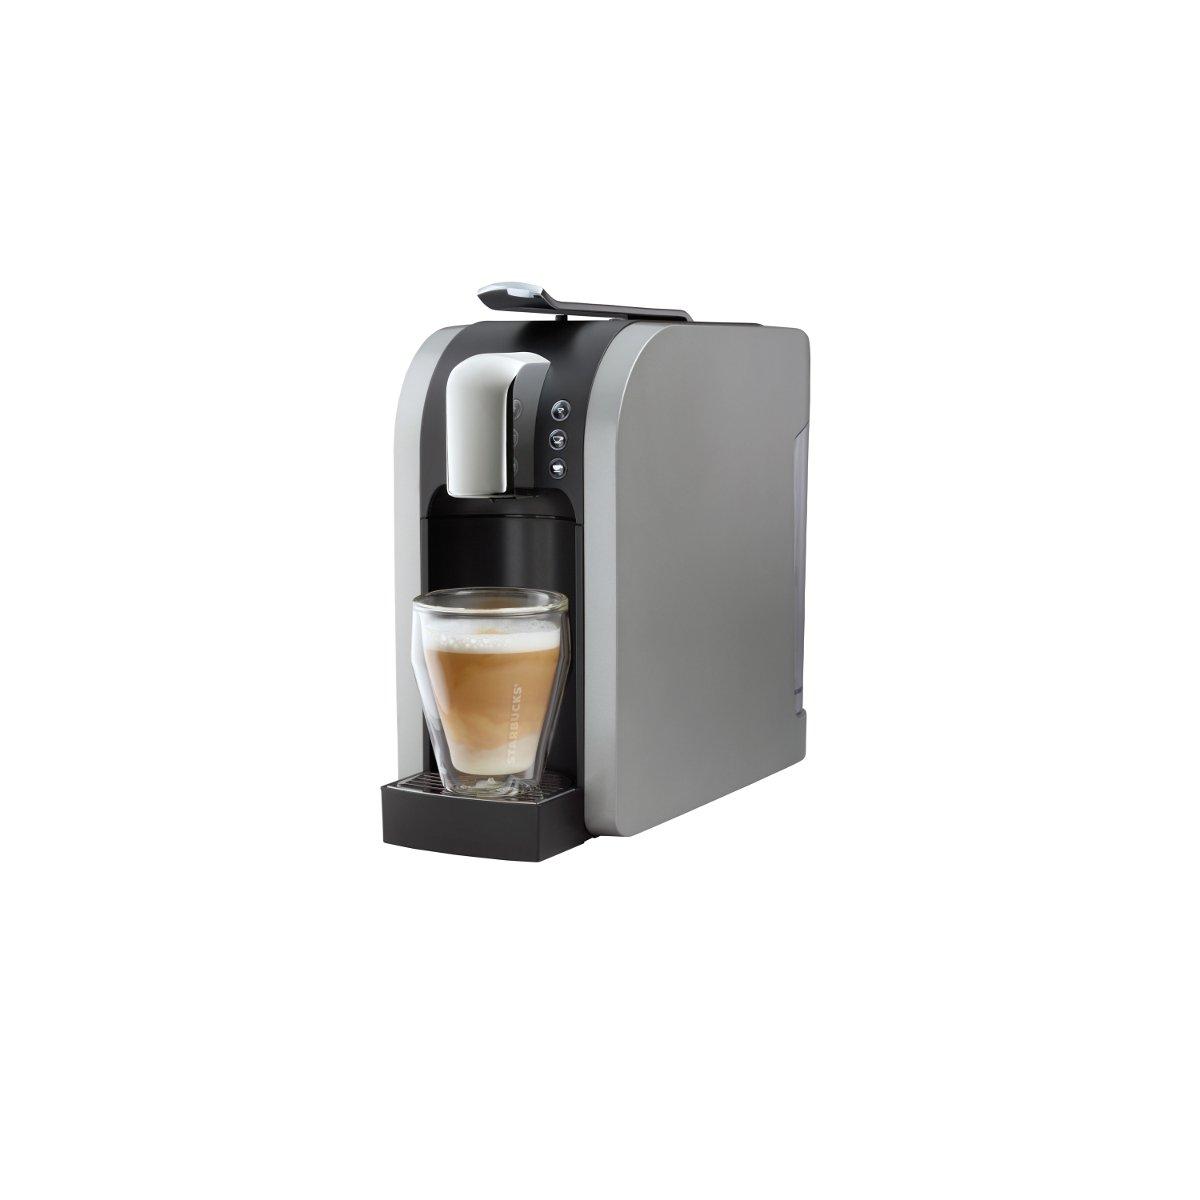 Electronic Starbucks Home Coffee Machine amazon com starbucks verismo 580 brewer silver 011023256 kitchen dining